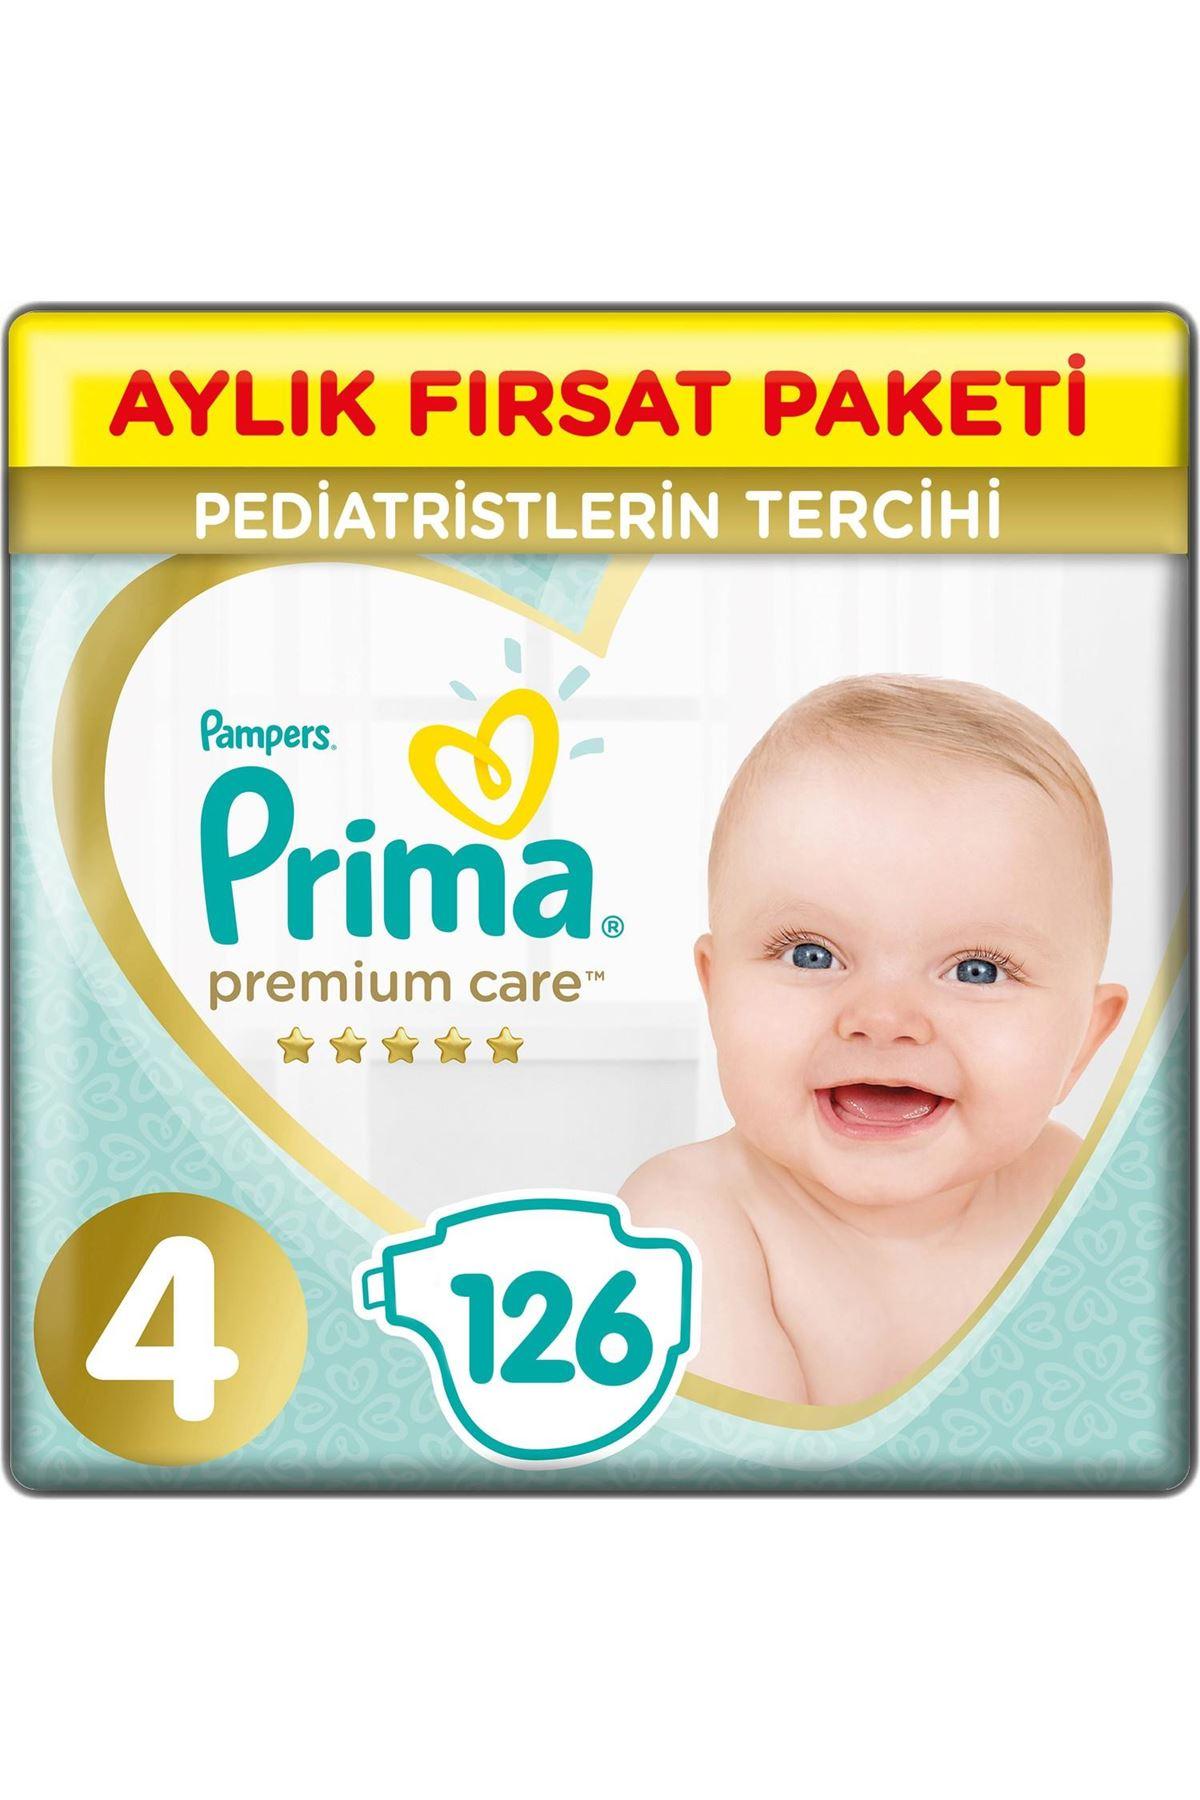 Prima Premium Care Aylık Fırsat Paketi 4 Beden 126 Adet